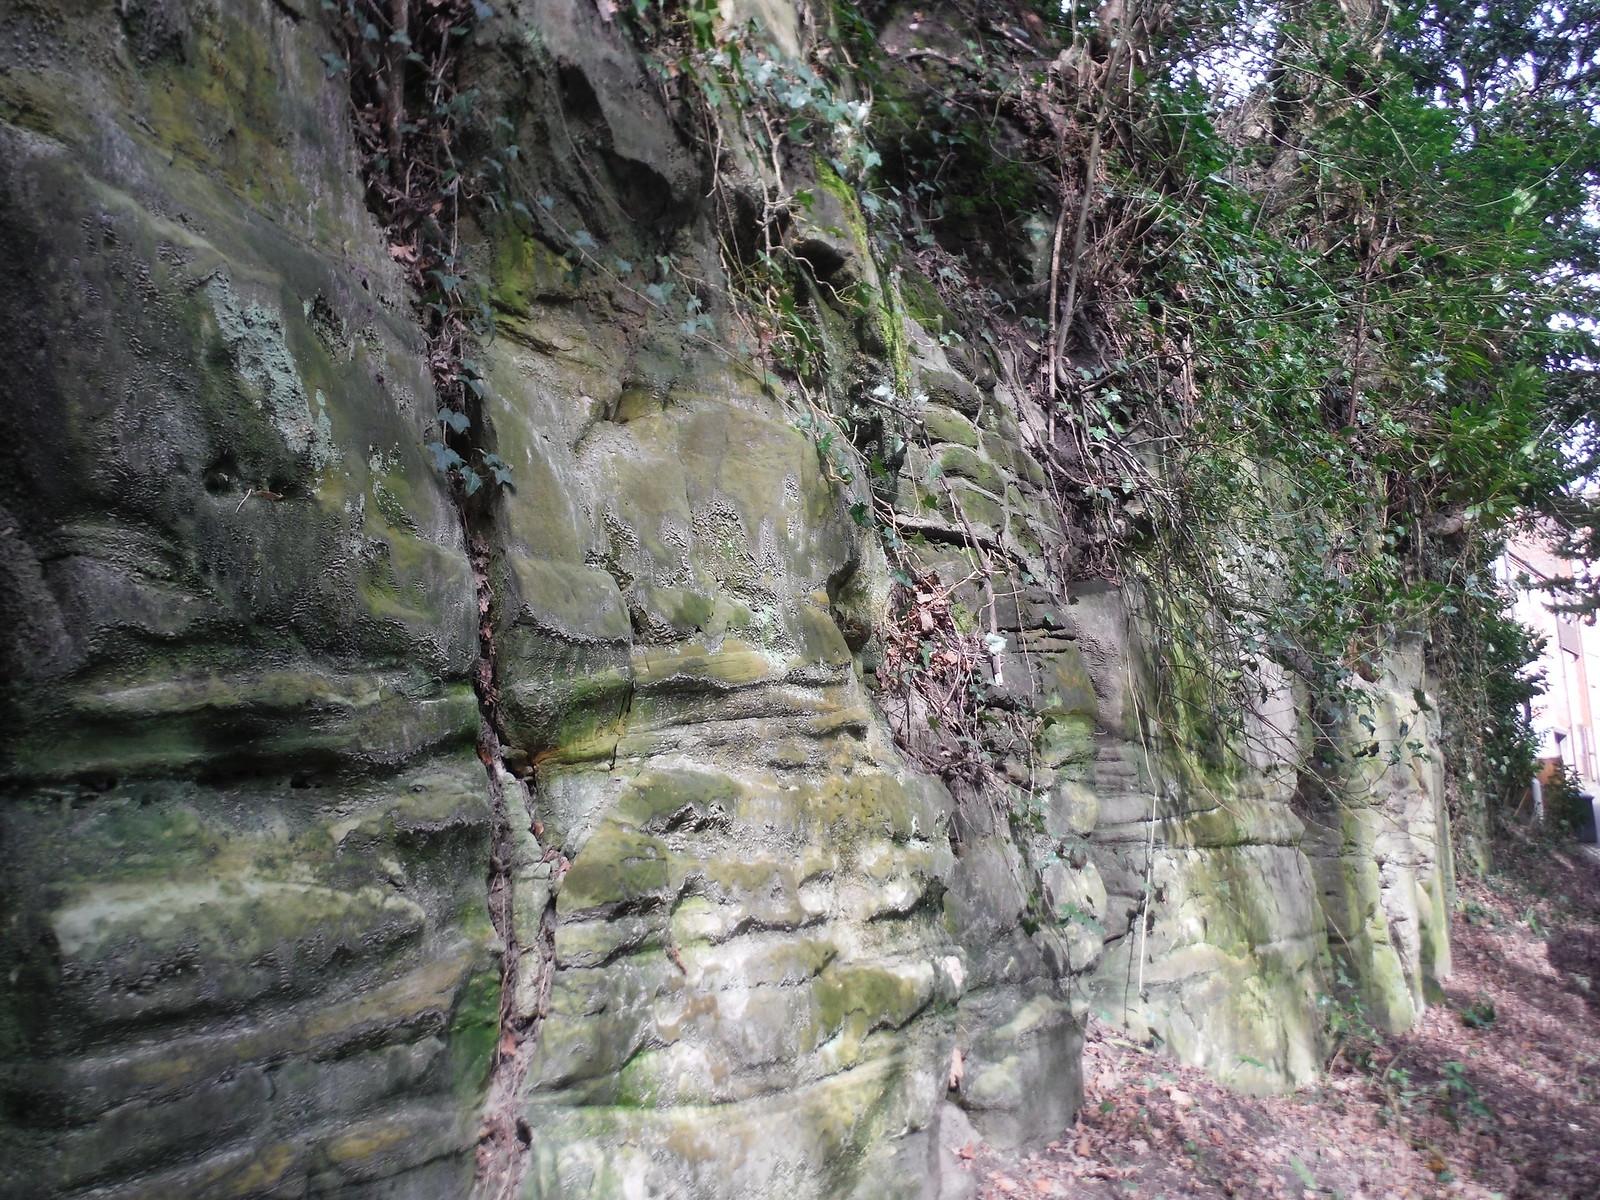 Sandstone bluff, Hermitage Lane - East Grinstead SWC Walk 27 - East Grinstead to Wivelsfield or Sheffield Park